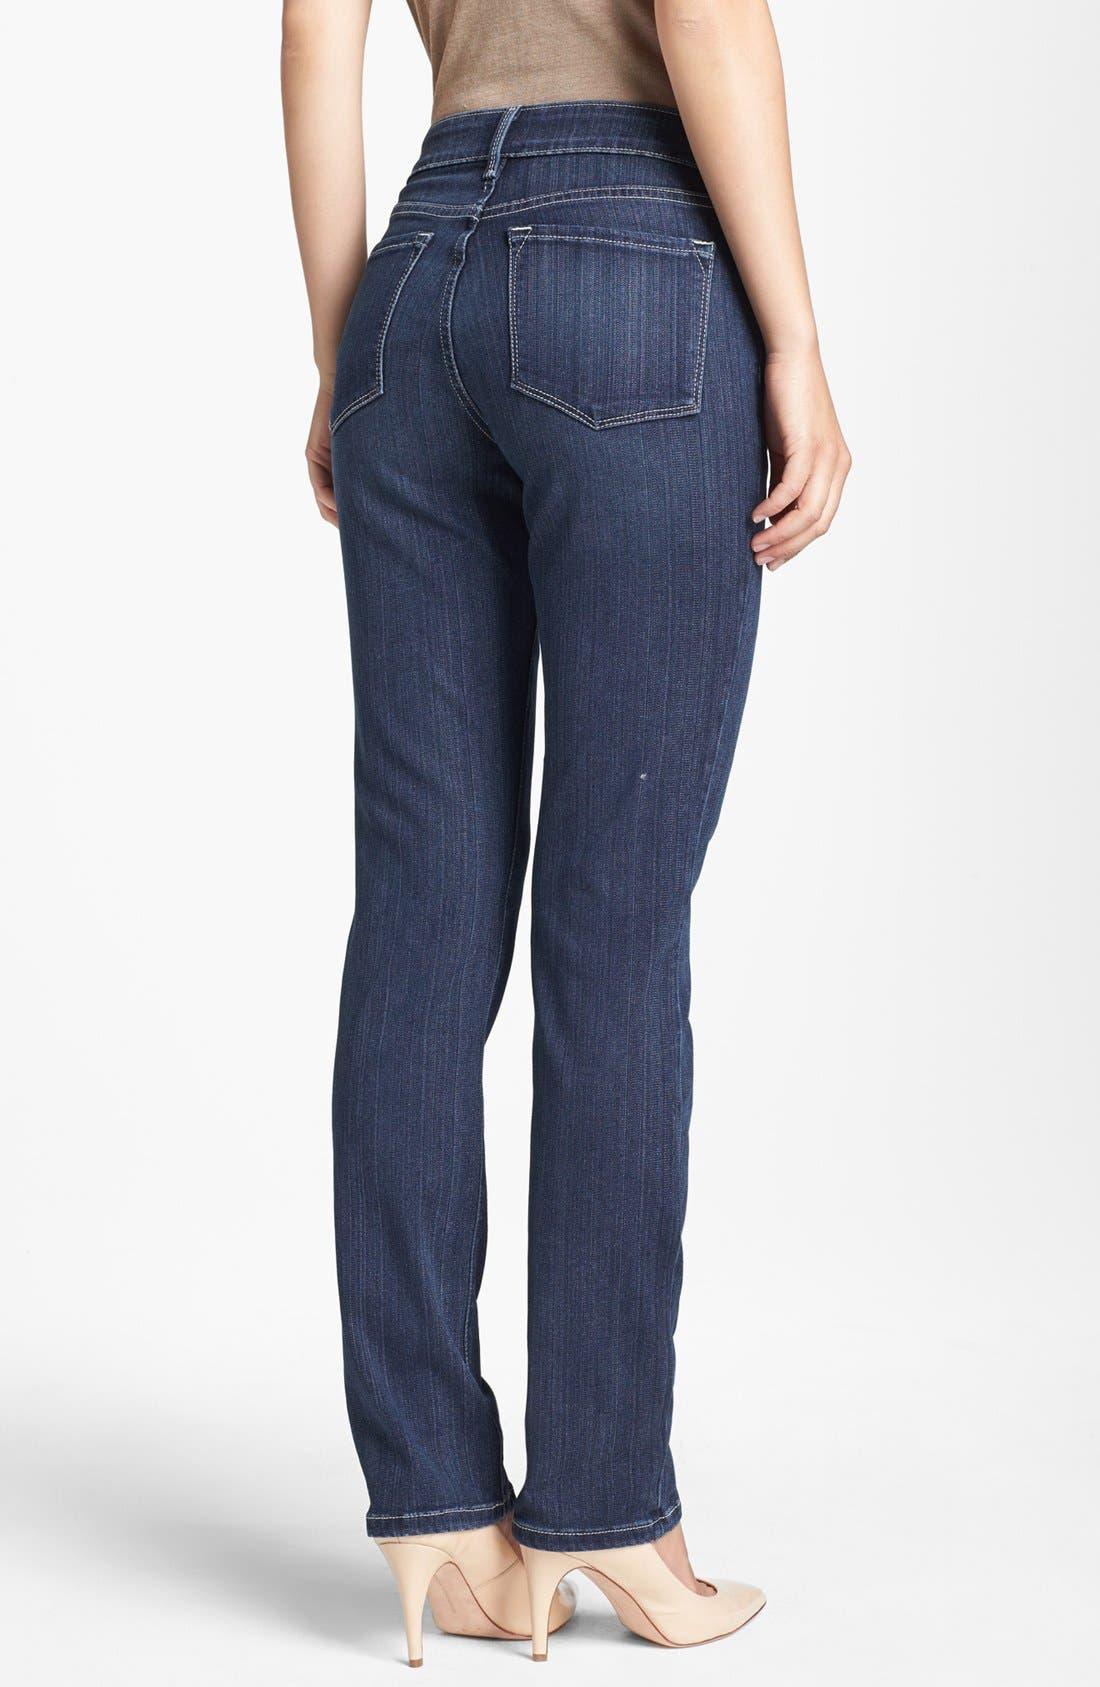 Alternate Image 2  - NYDJ 'Sheri' Stretch Skinny Jeans (Regular & Petite)